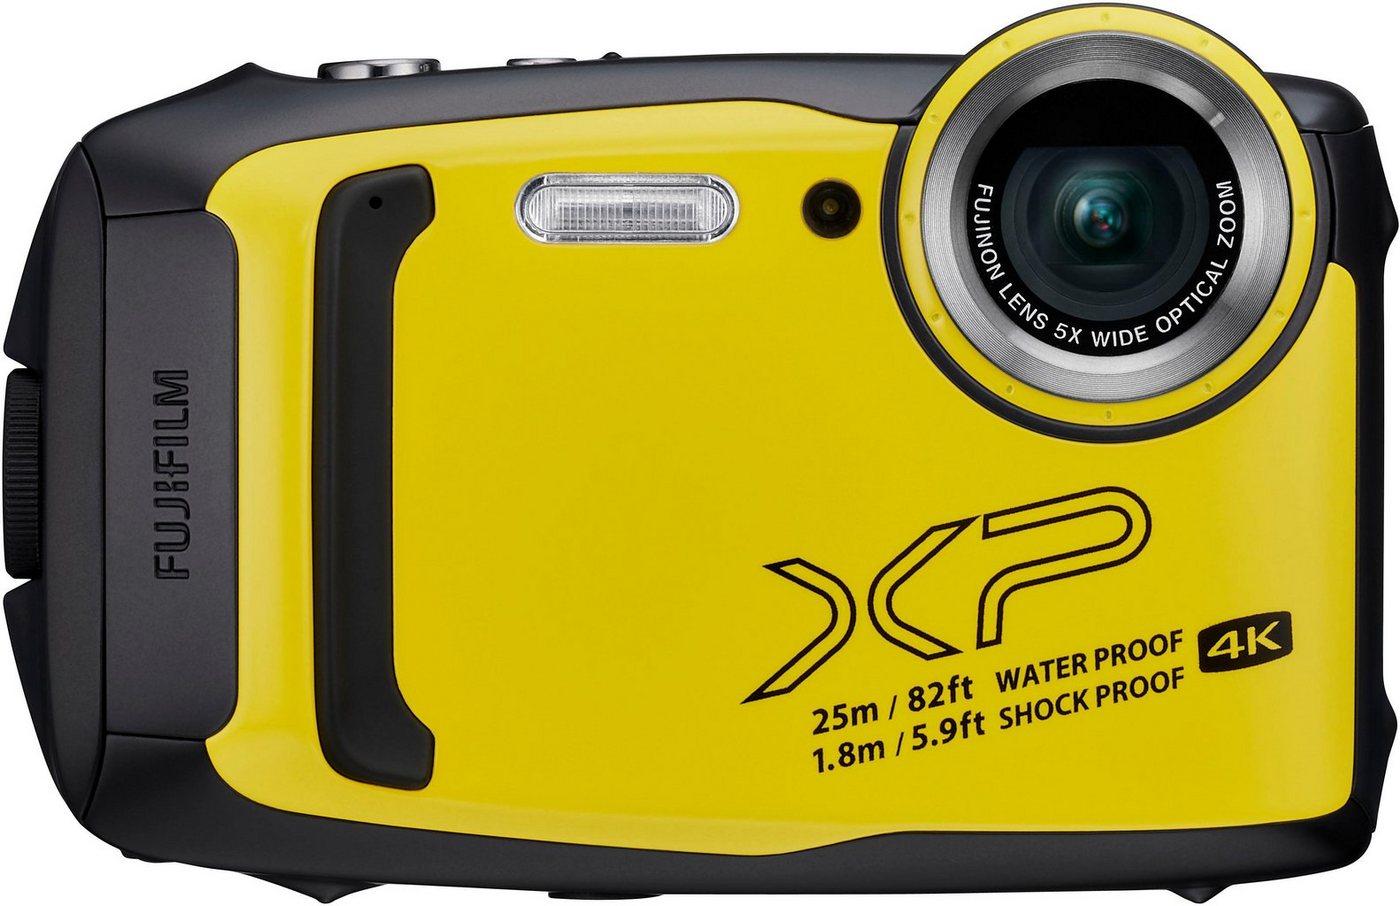 Action, Outdoorkameras - Fujifilm »Finepix XP140« Outdoor Kamera (FUJINON, 5 fach optischem Zoom, F3,9 (W) – F4,9 (T), 16,4 MP, 5x opt. Zoom, Bluetooth, WLAN (Wi Fi)  - Onlineshop OTTO